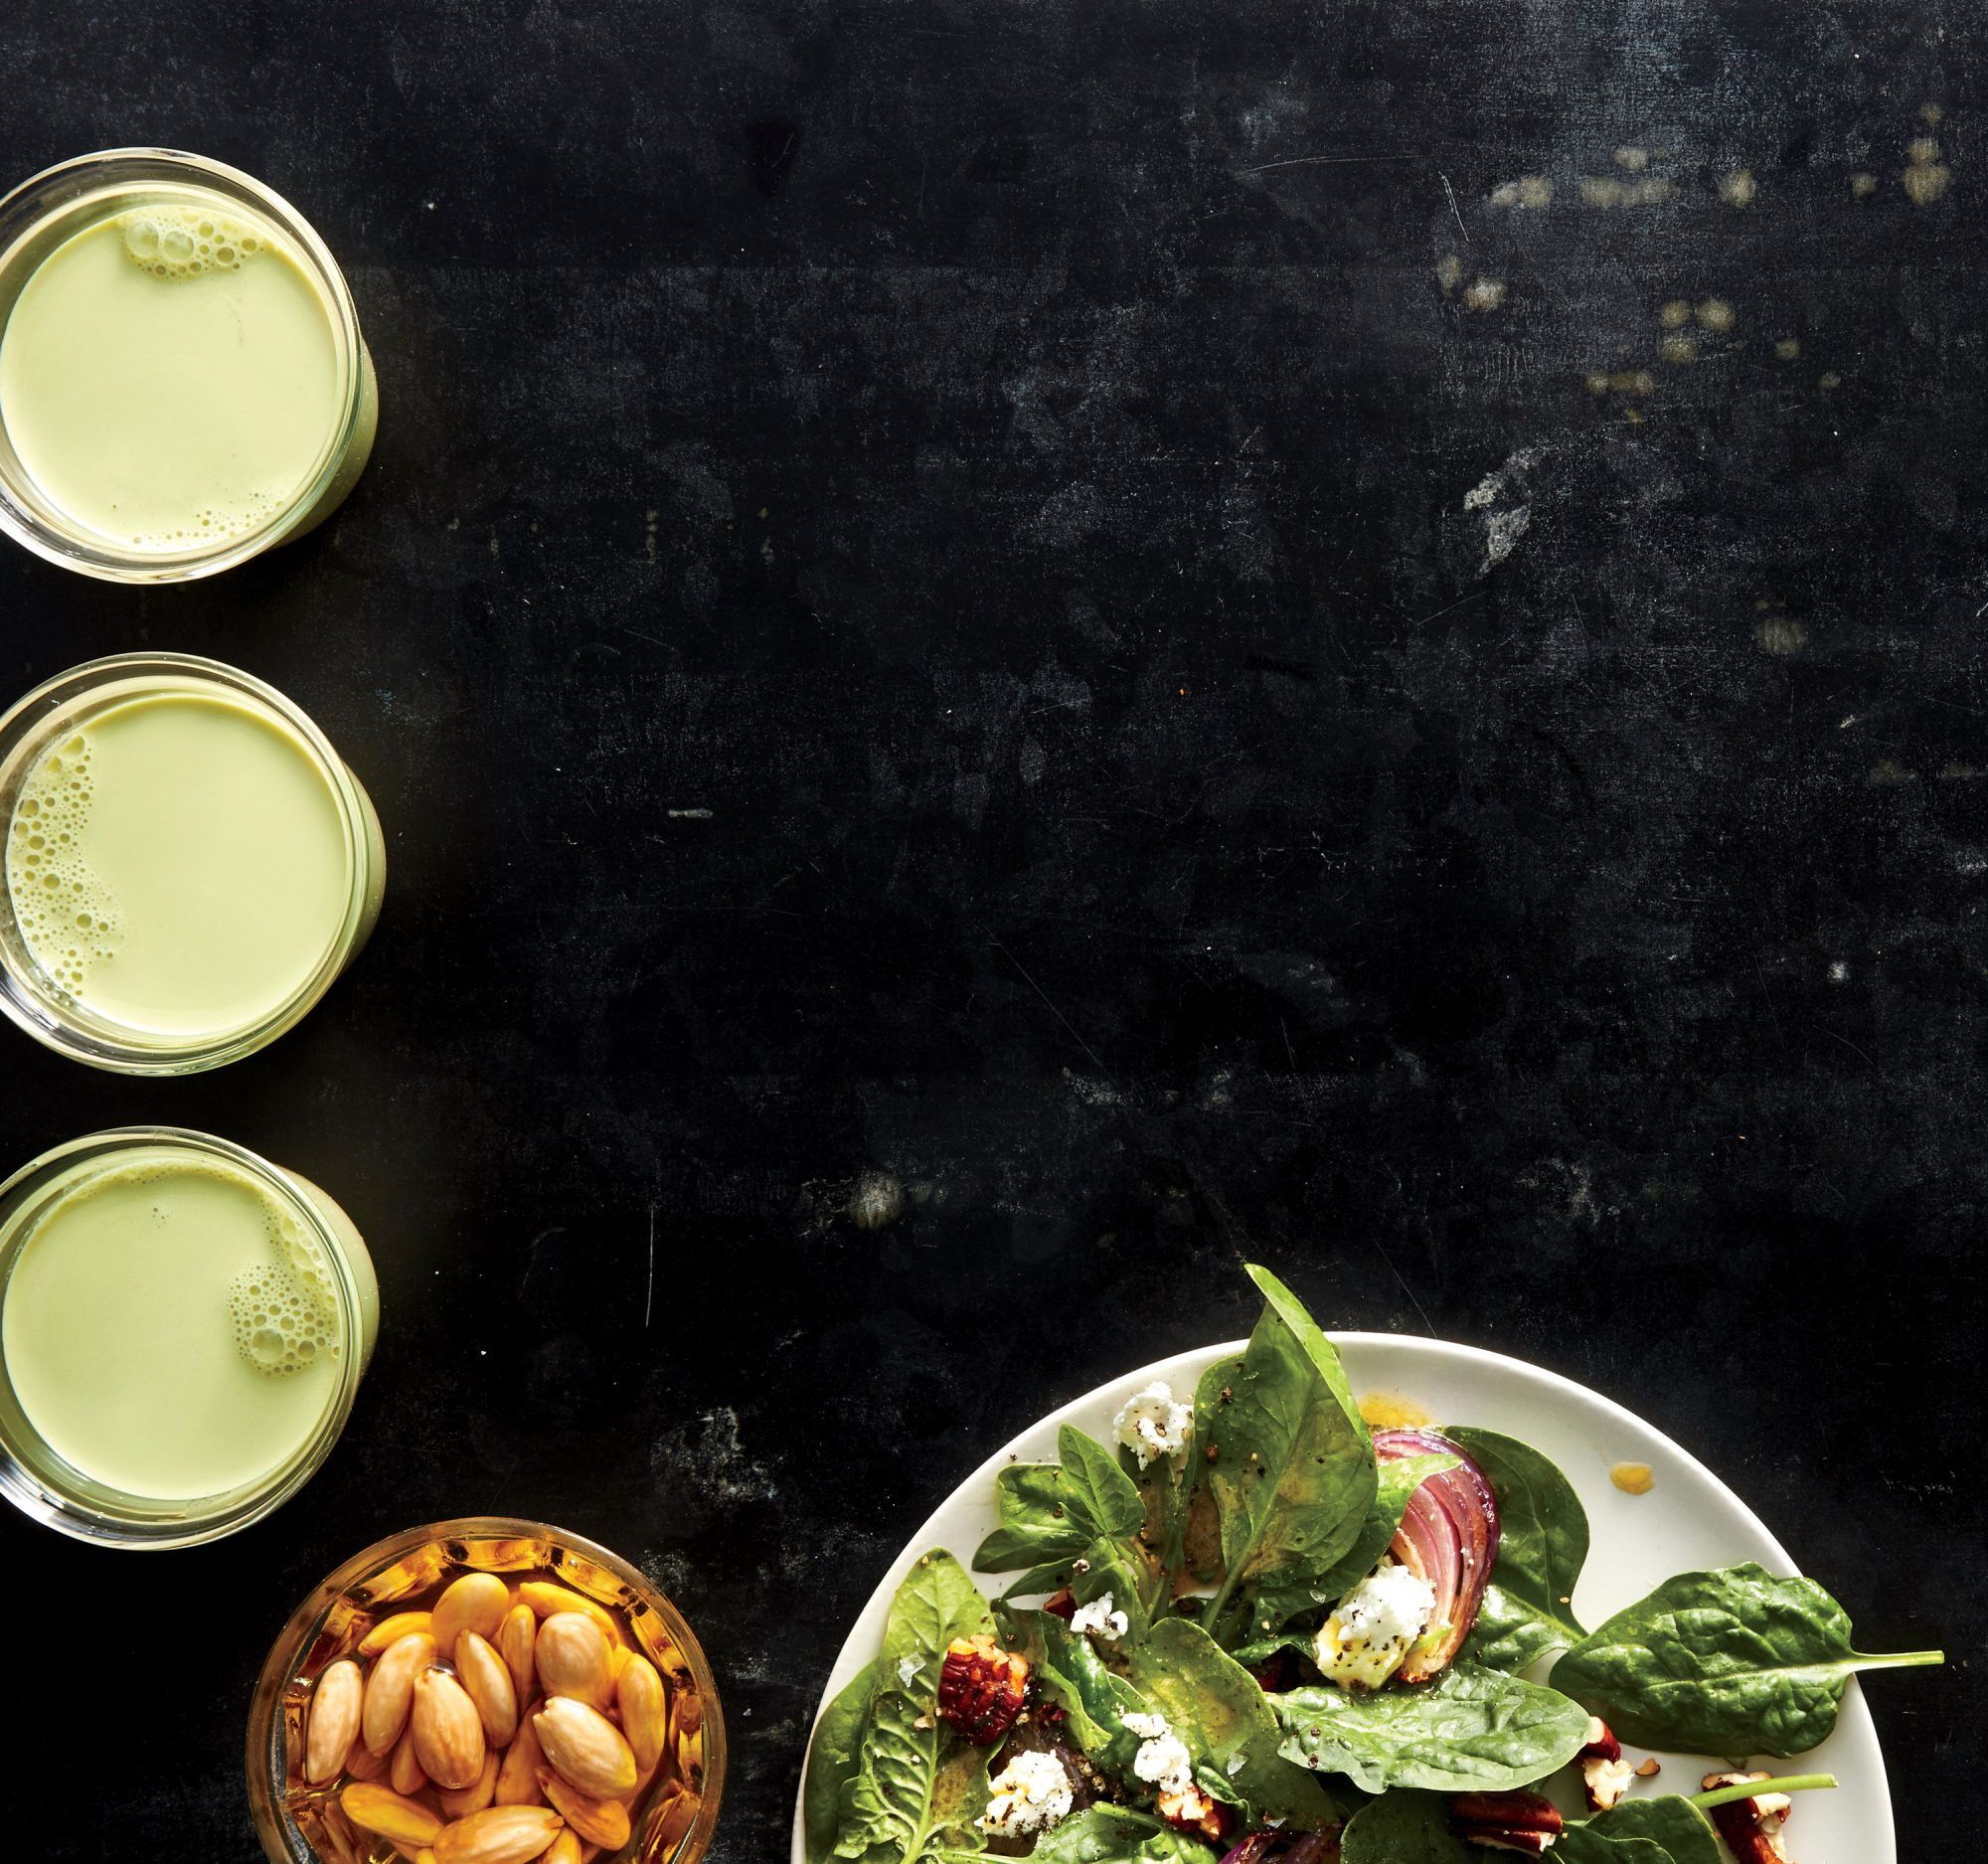 Spinach Salad with Smoked Pecan Vinaigrette